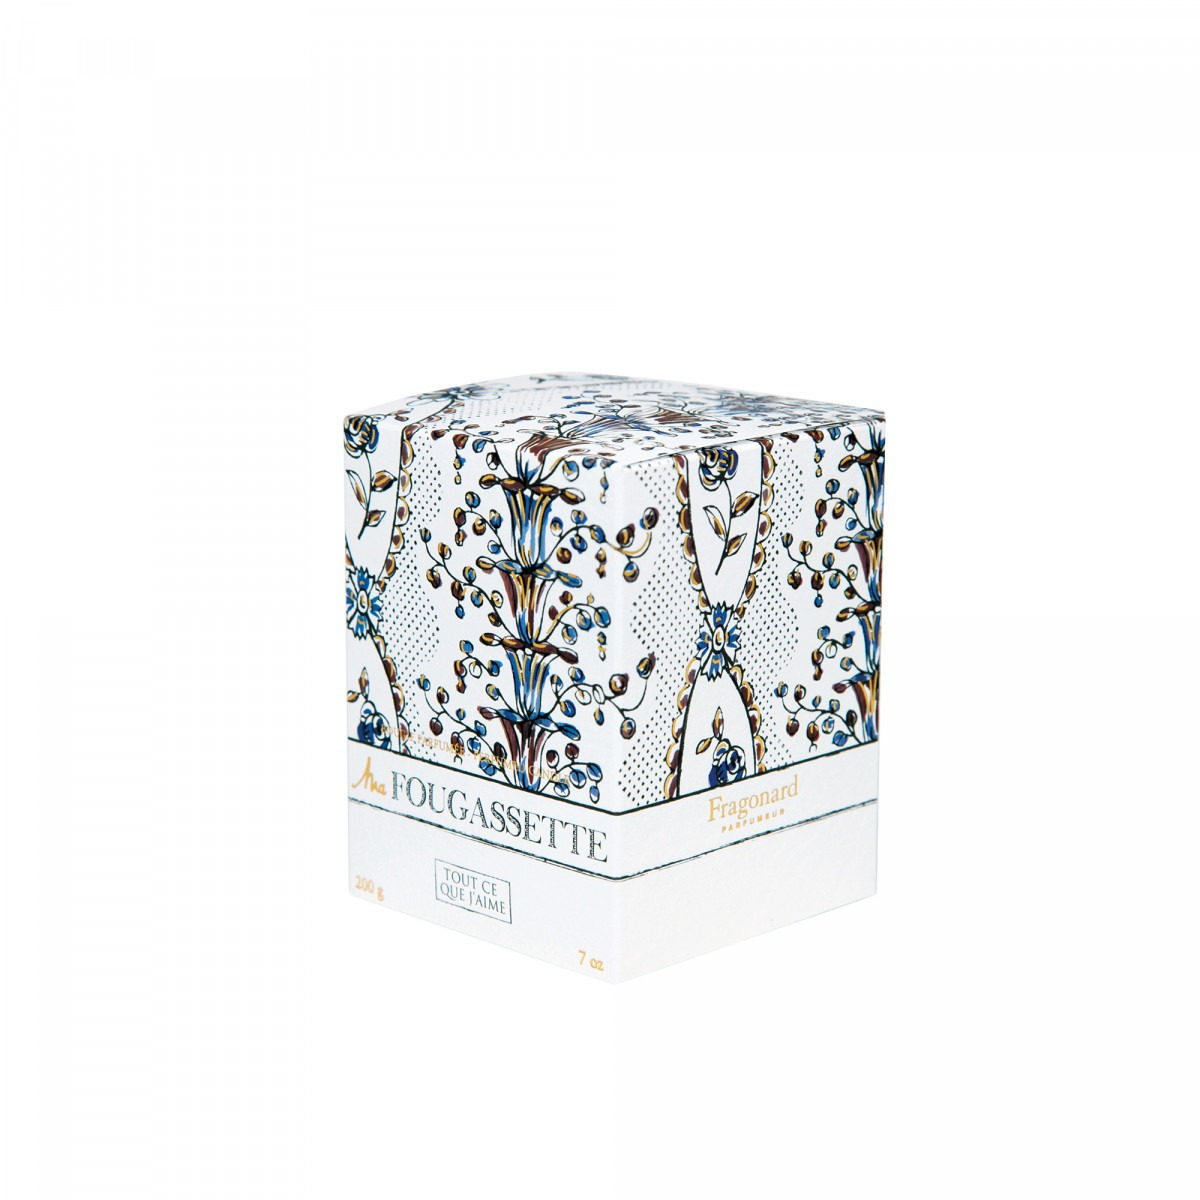 Fragonard Tout Ce Que J'aime Candle 200G – Ma Fougassette